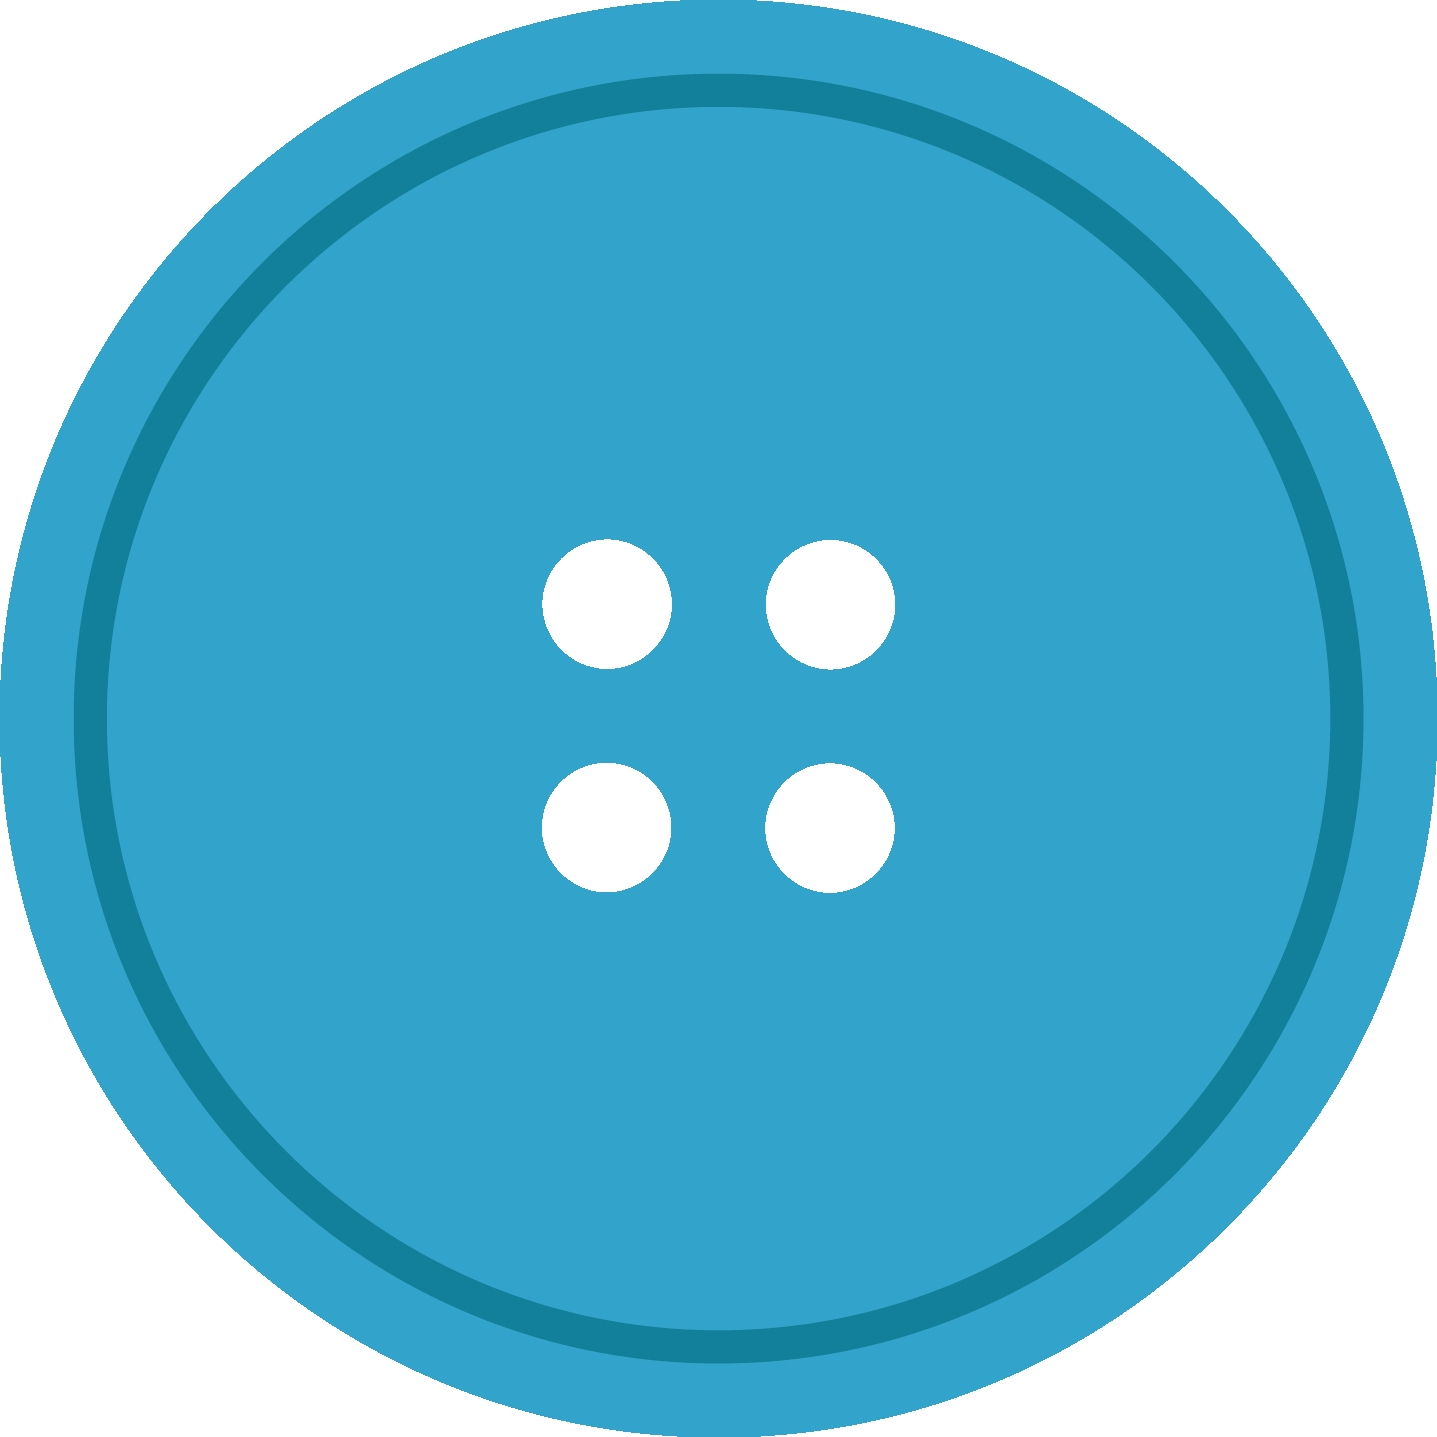 Button clipart sewing button. Best of design digital